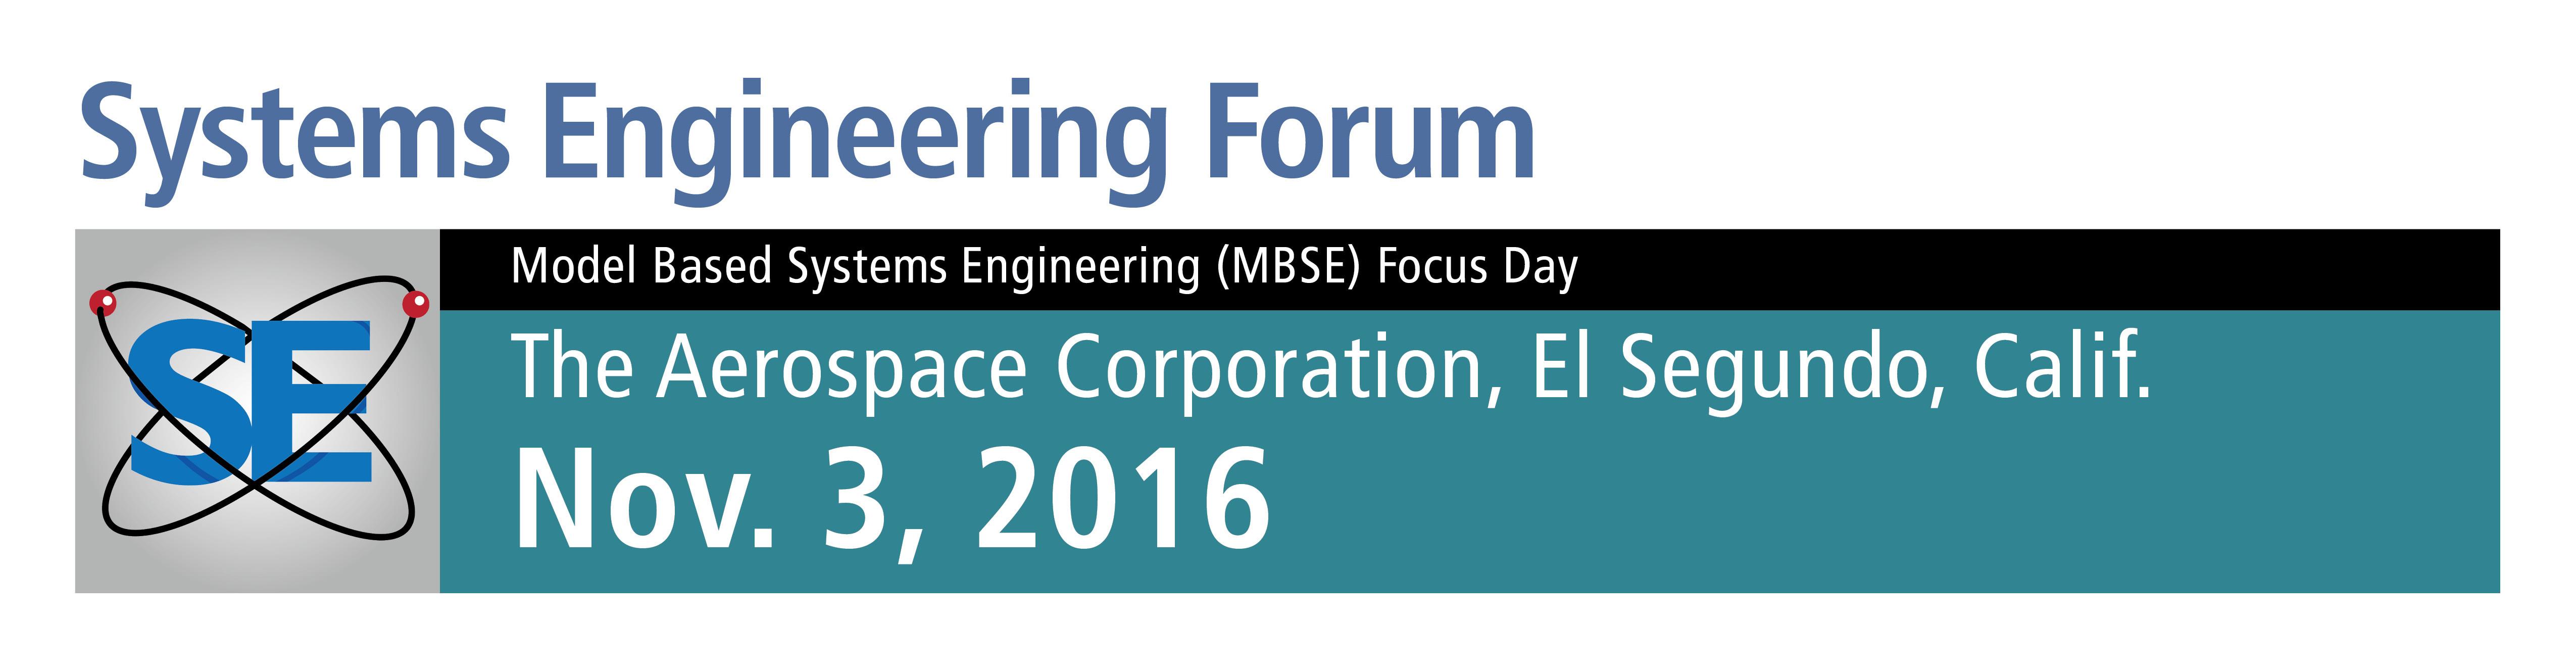 2016 Systems Engineering Forum